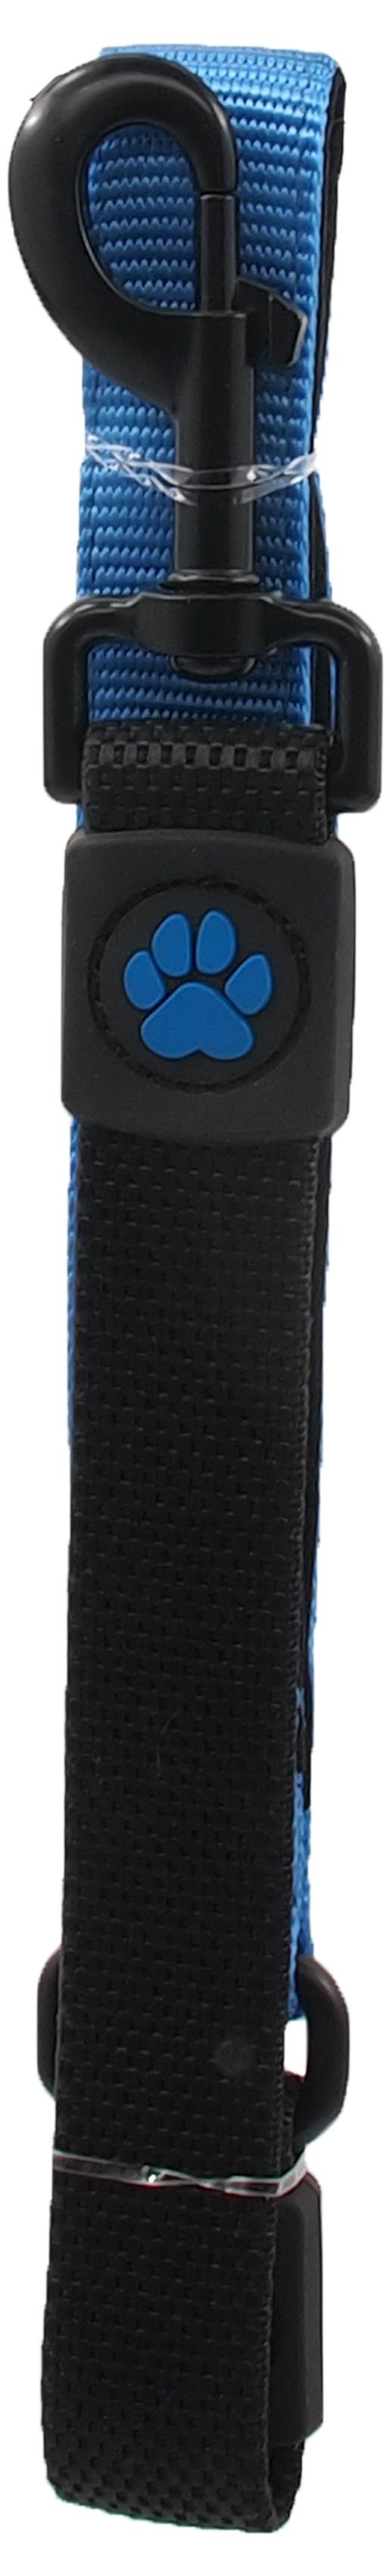 Vodítko Active Dog Bungee Neoprene L modré 2,5x55cm